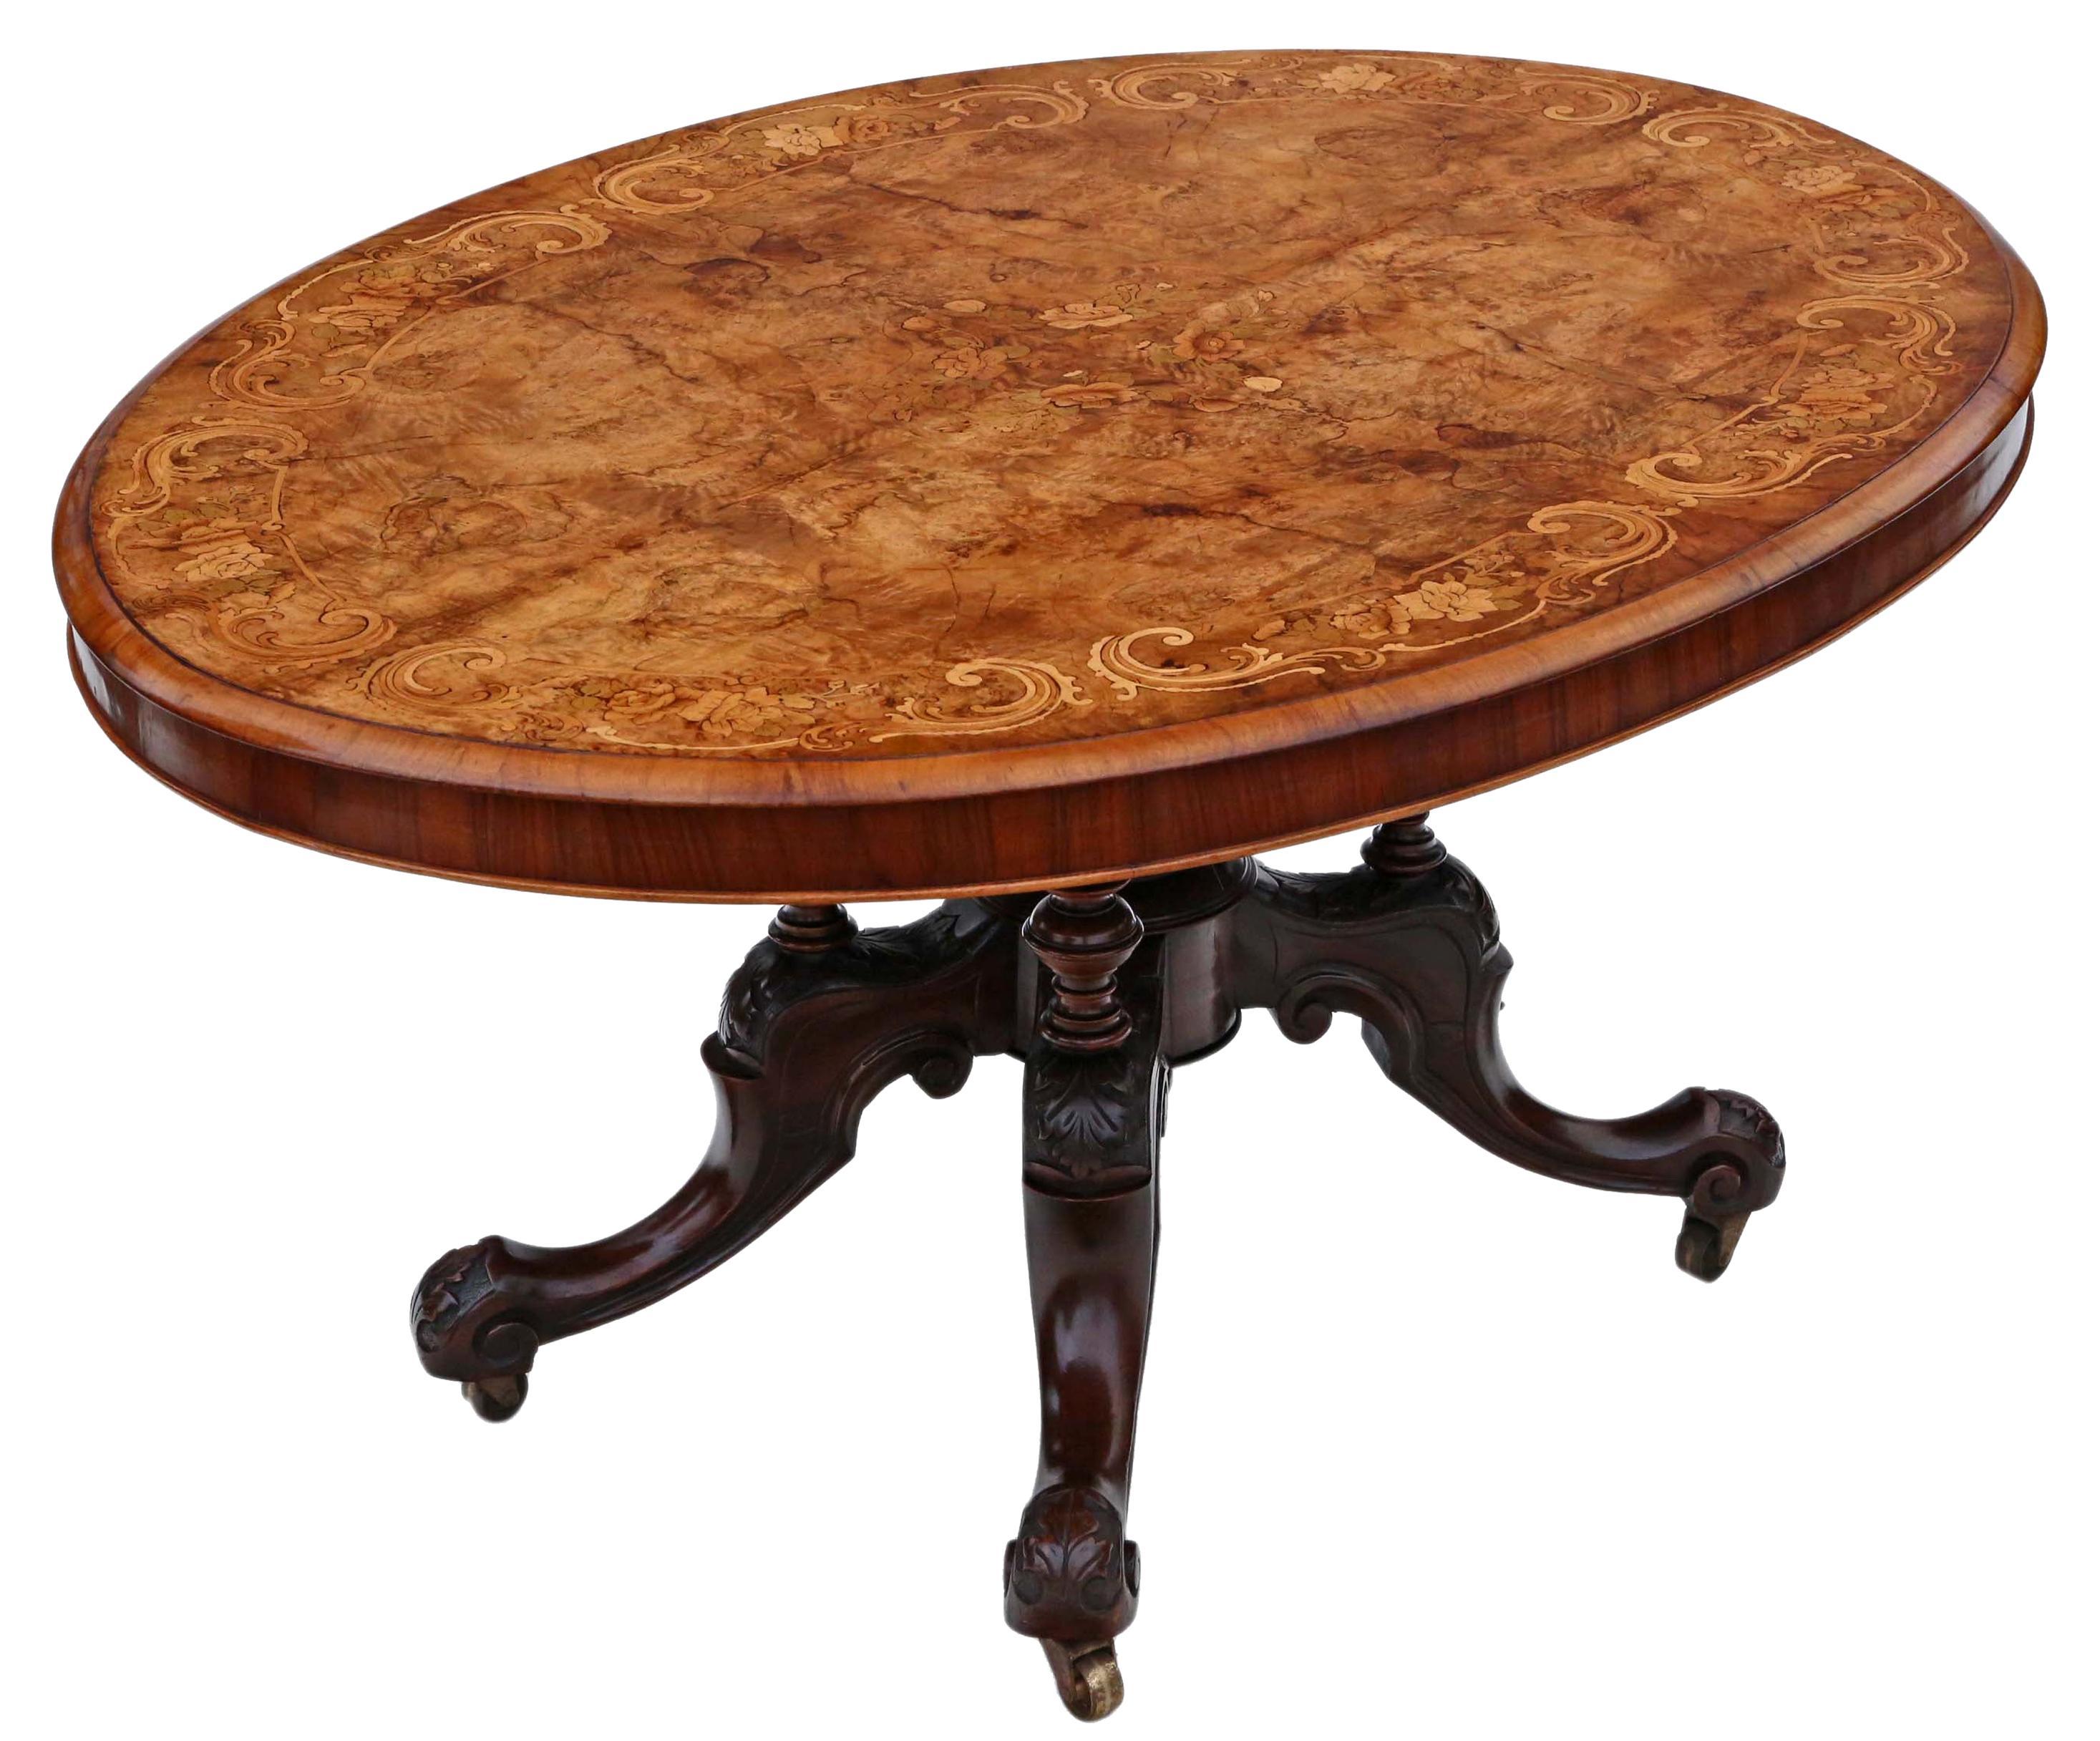 Antique Victorian Burr Walnut Marquetry Oval Loo Breakfast Table Tilt Top